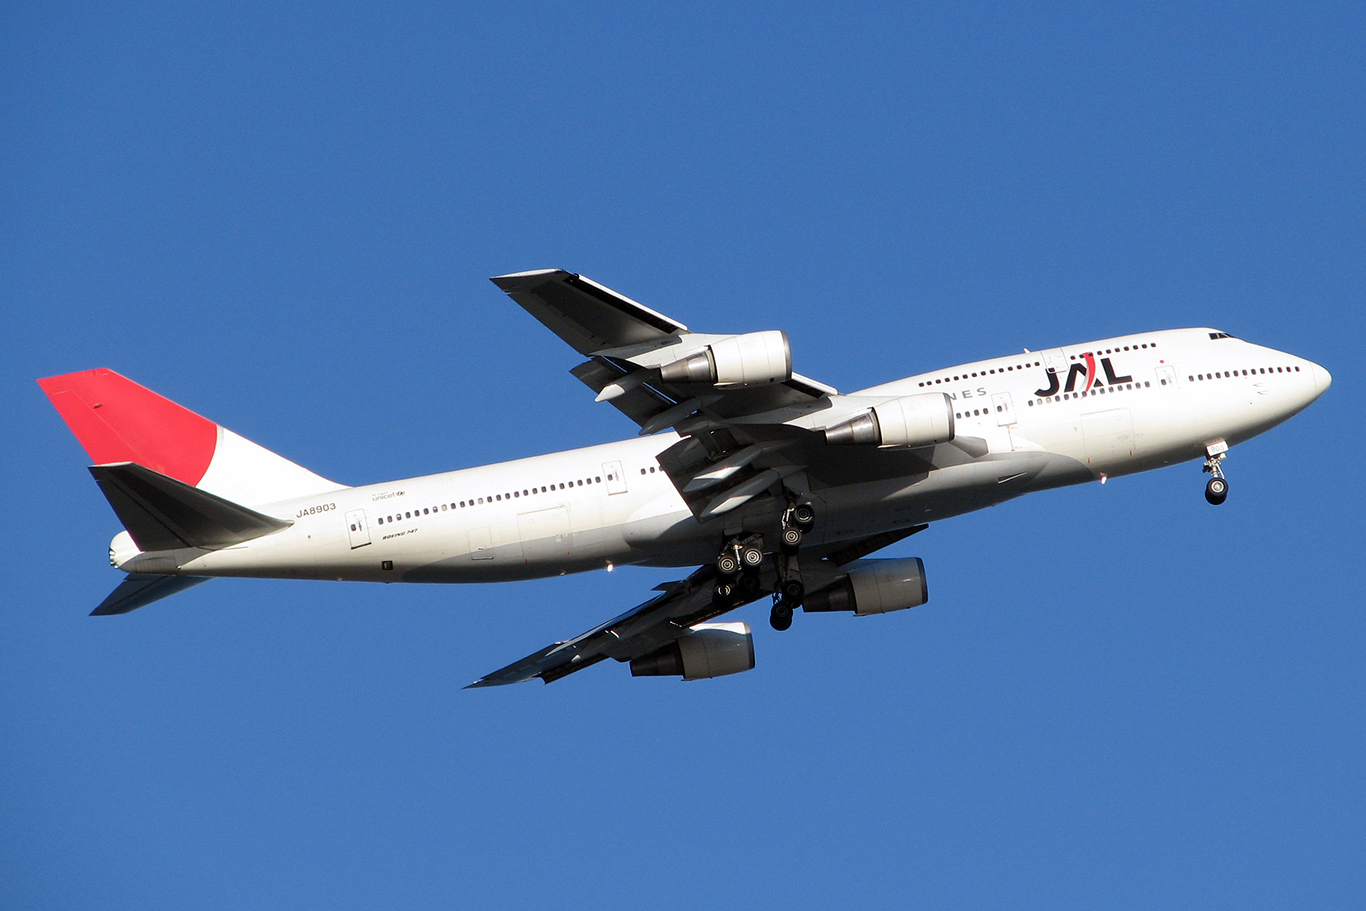 JL/JAL/日本航空 B747-400D JA8903